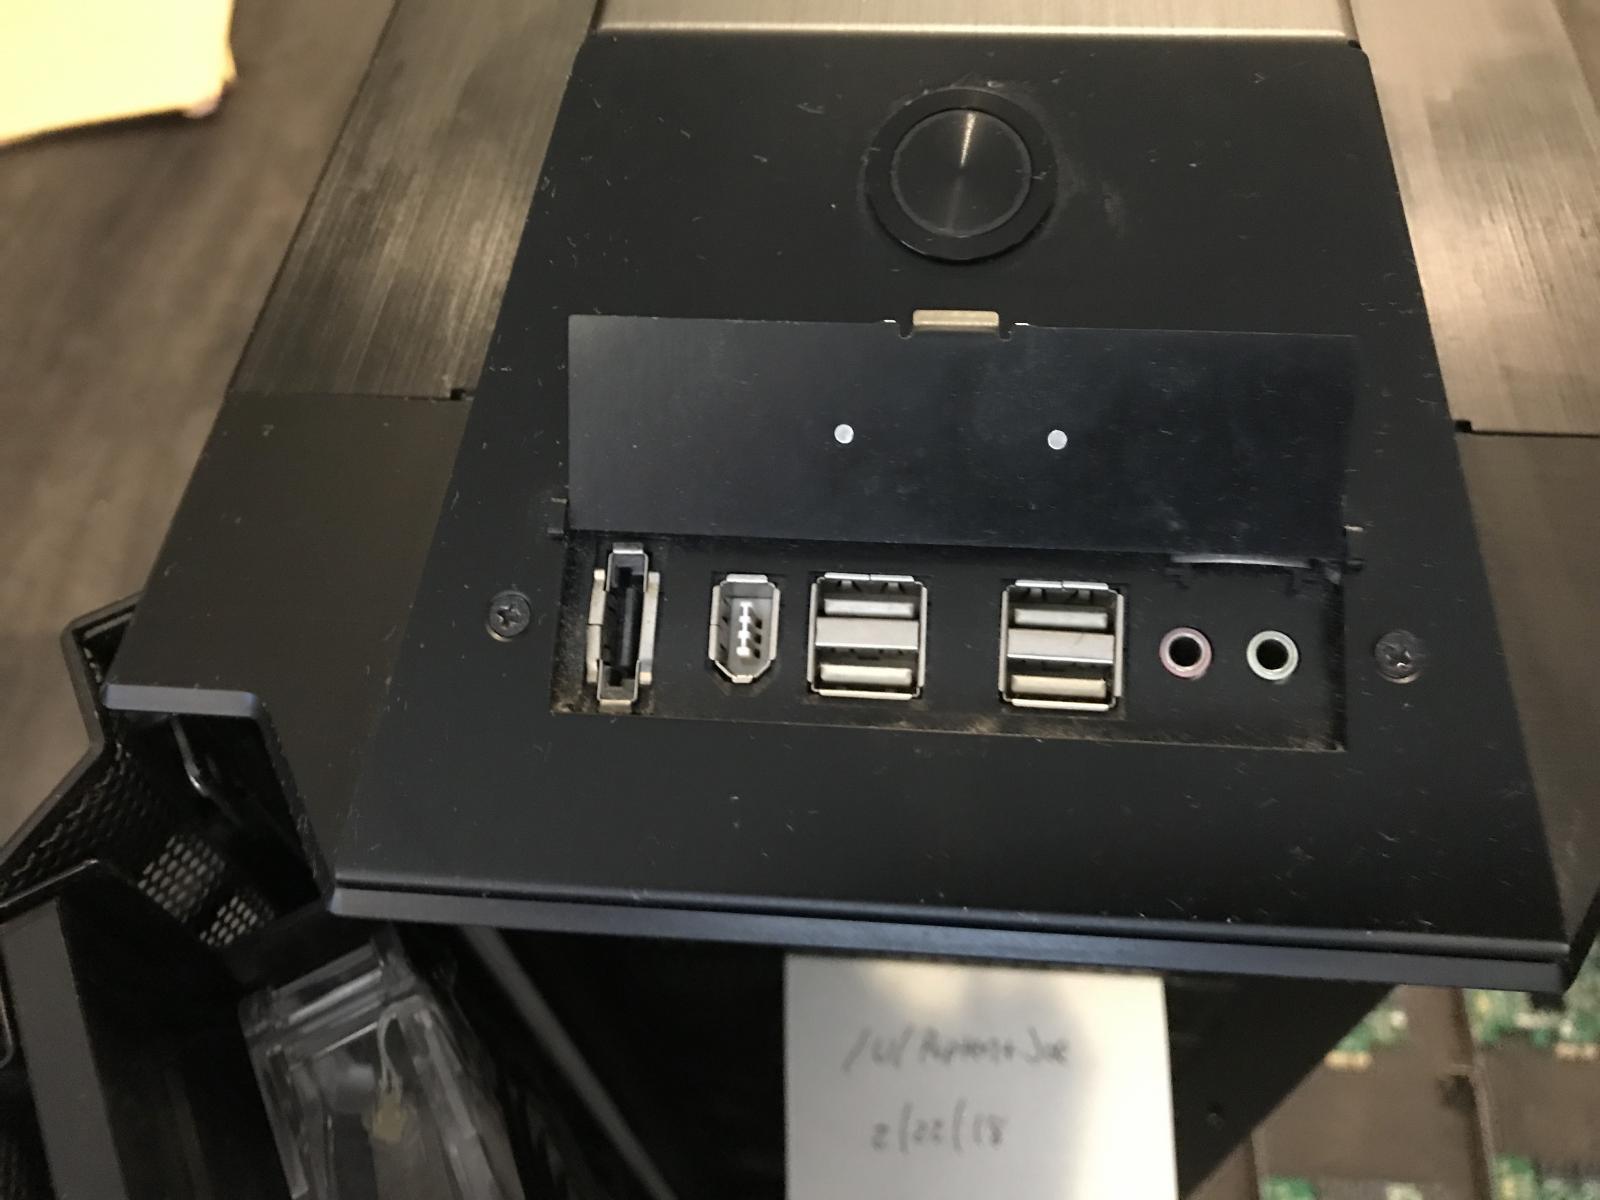 Photo of Lian Li Armorsuit PC-P80 Black